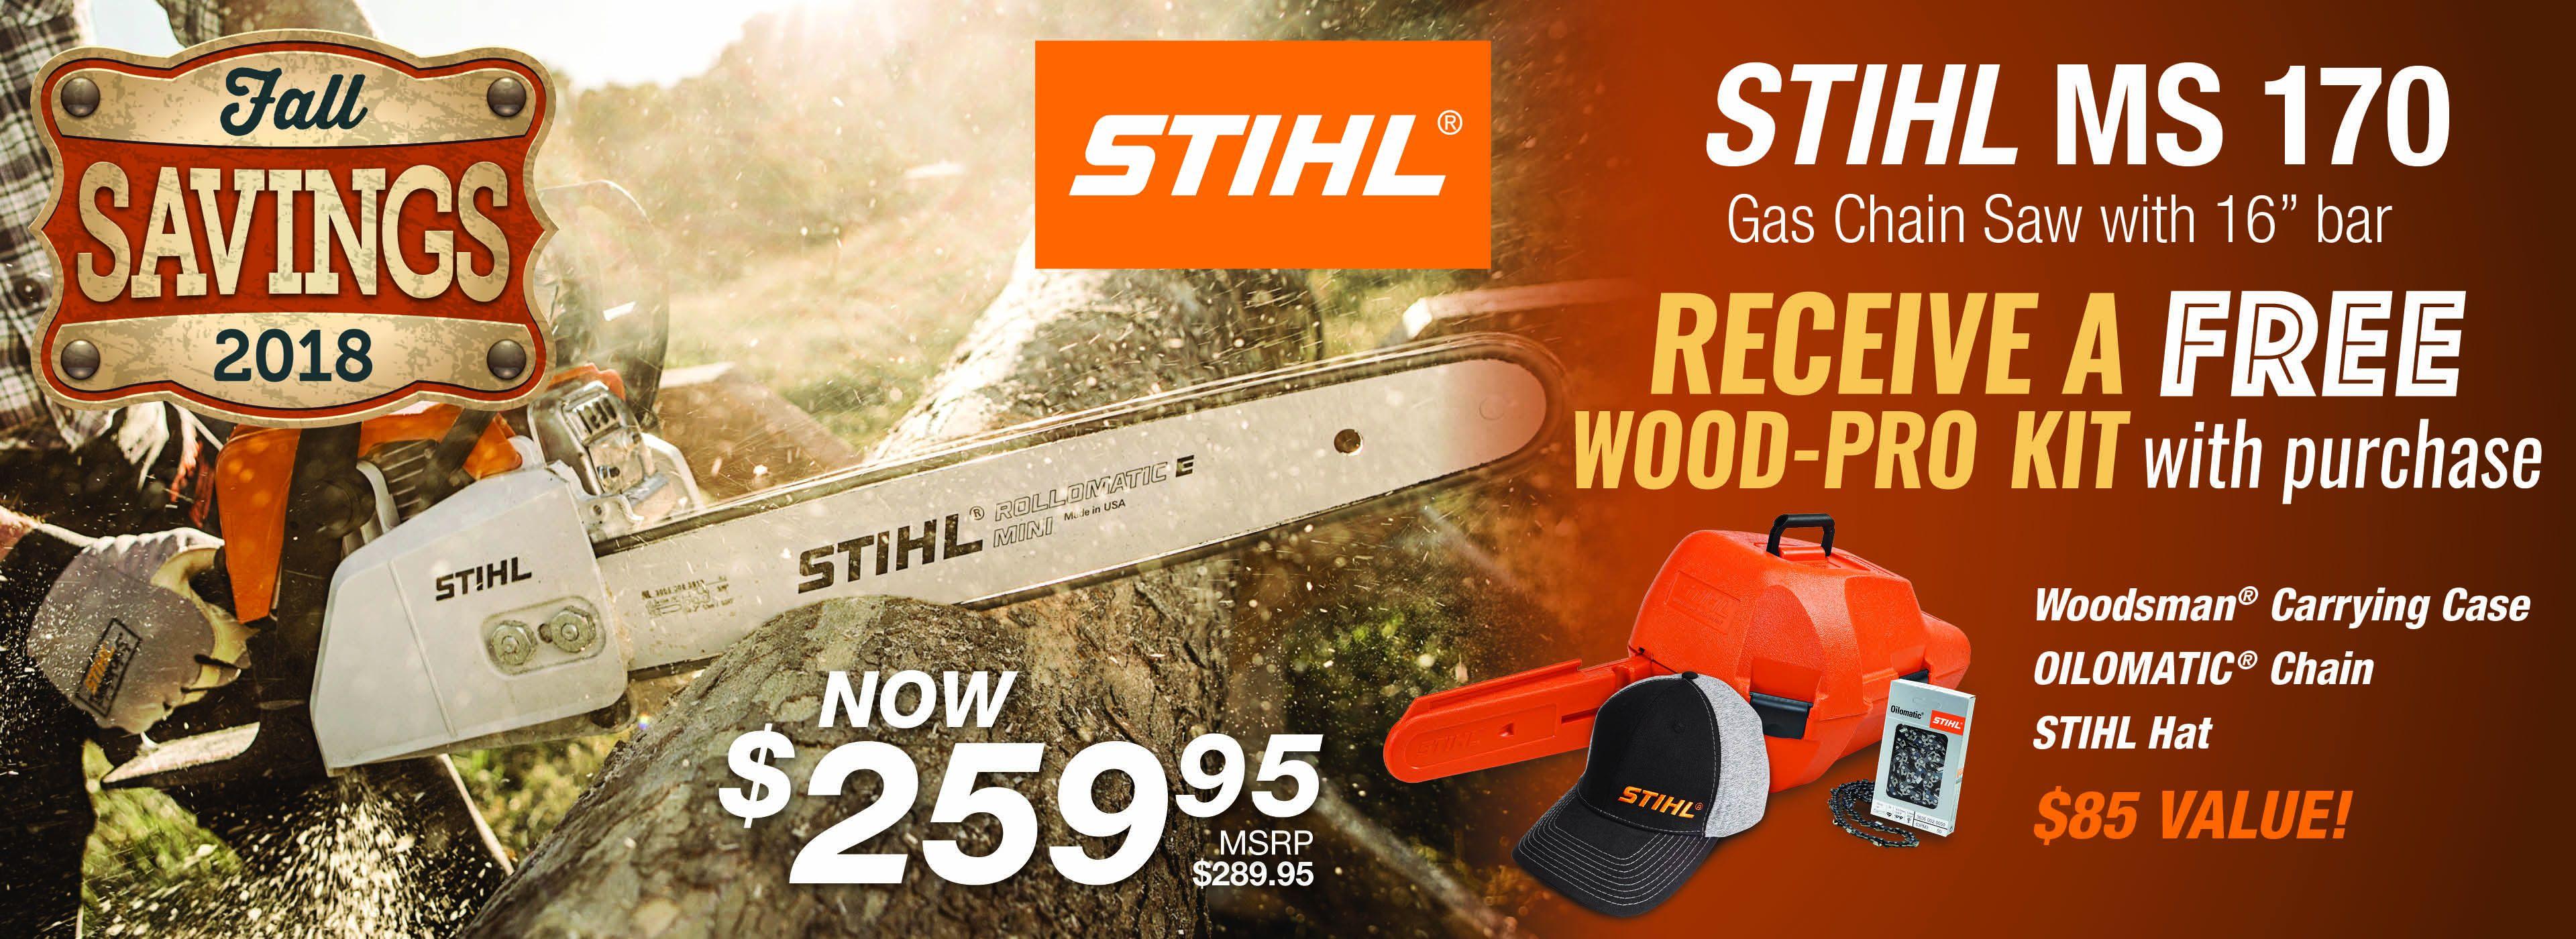 STIHL Wood-Pro Kit 2018